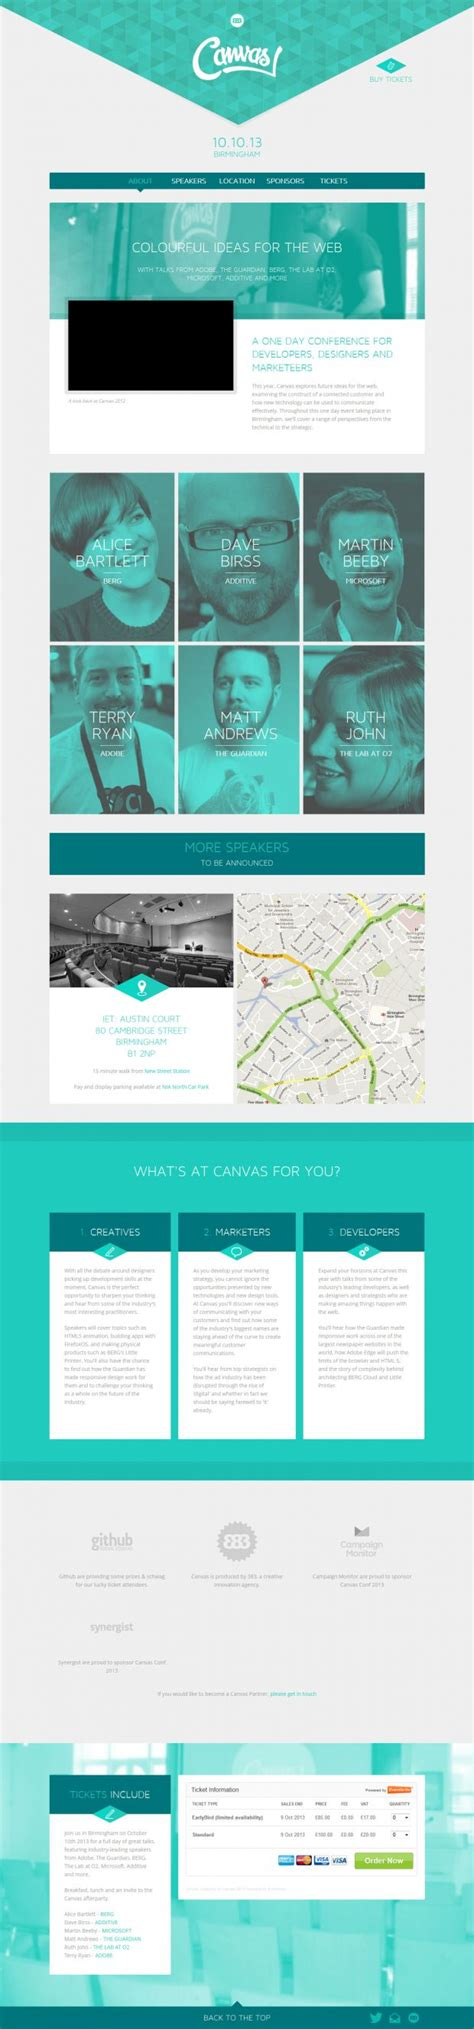 website design inspiration uk canvas conf 2013 webdesign inspiration www niceoneilike com